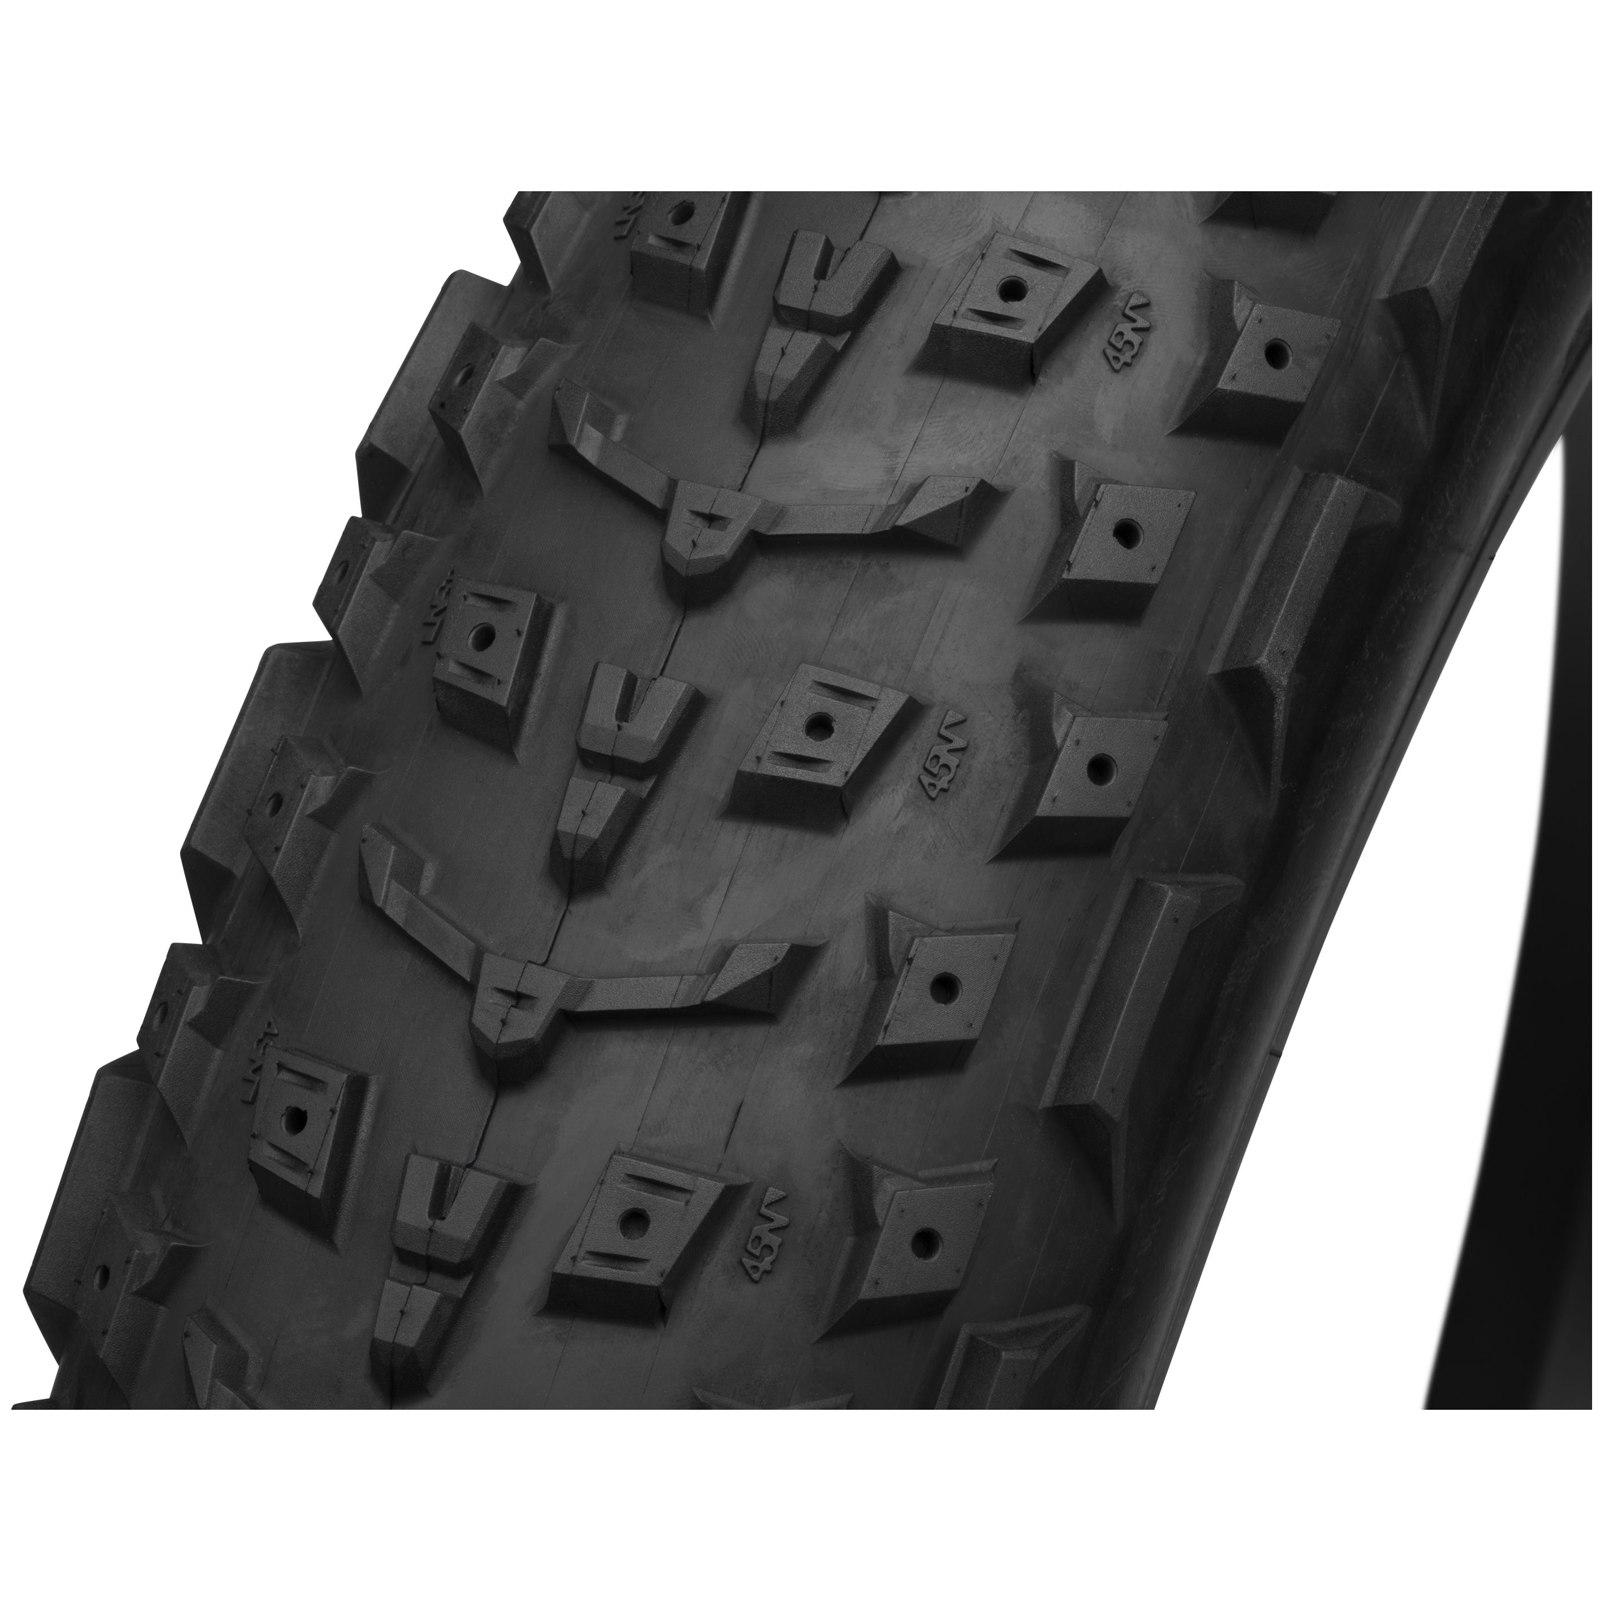 Imagen de 45NRTH Dillinger 4 Fatbike Folding Tire - Spike Ready - Tubeless Ready - 27.5x4.0 Inches - 120TPI Ultralight